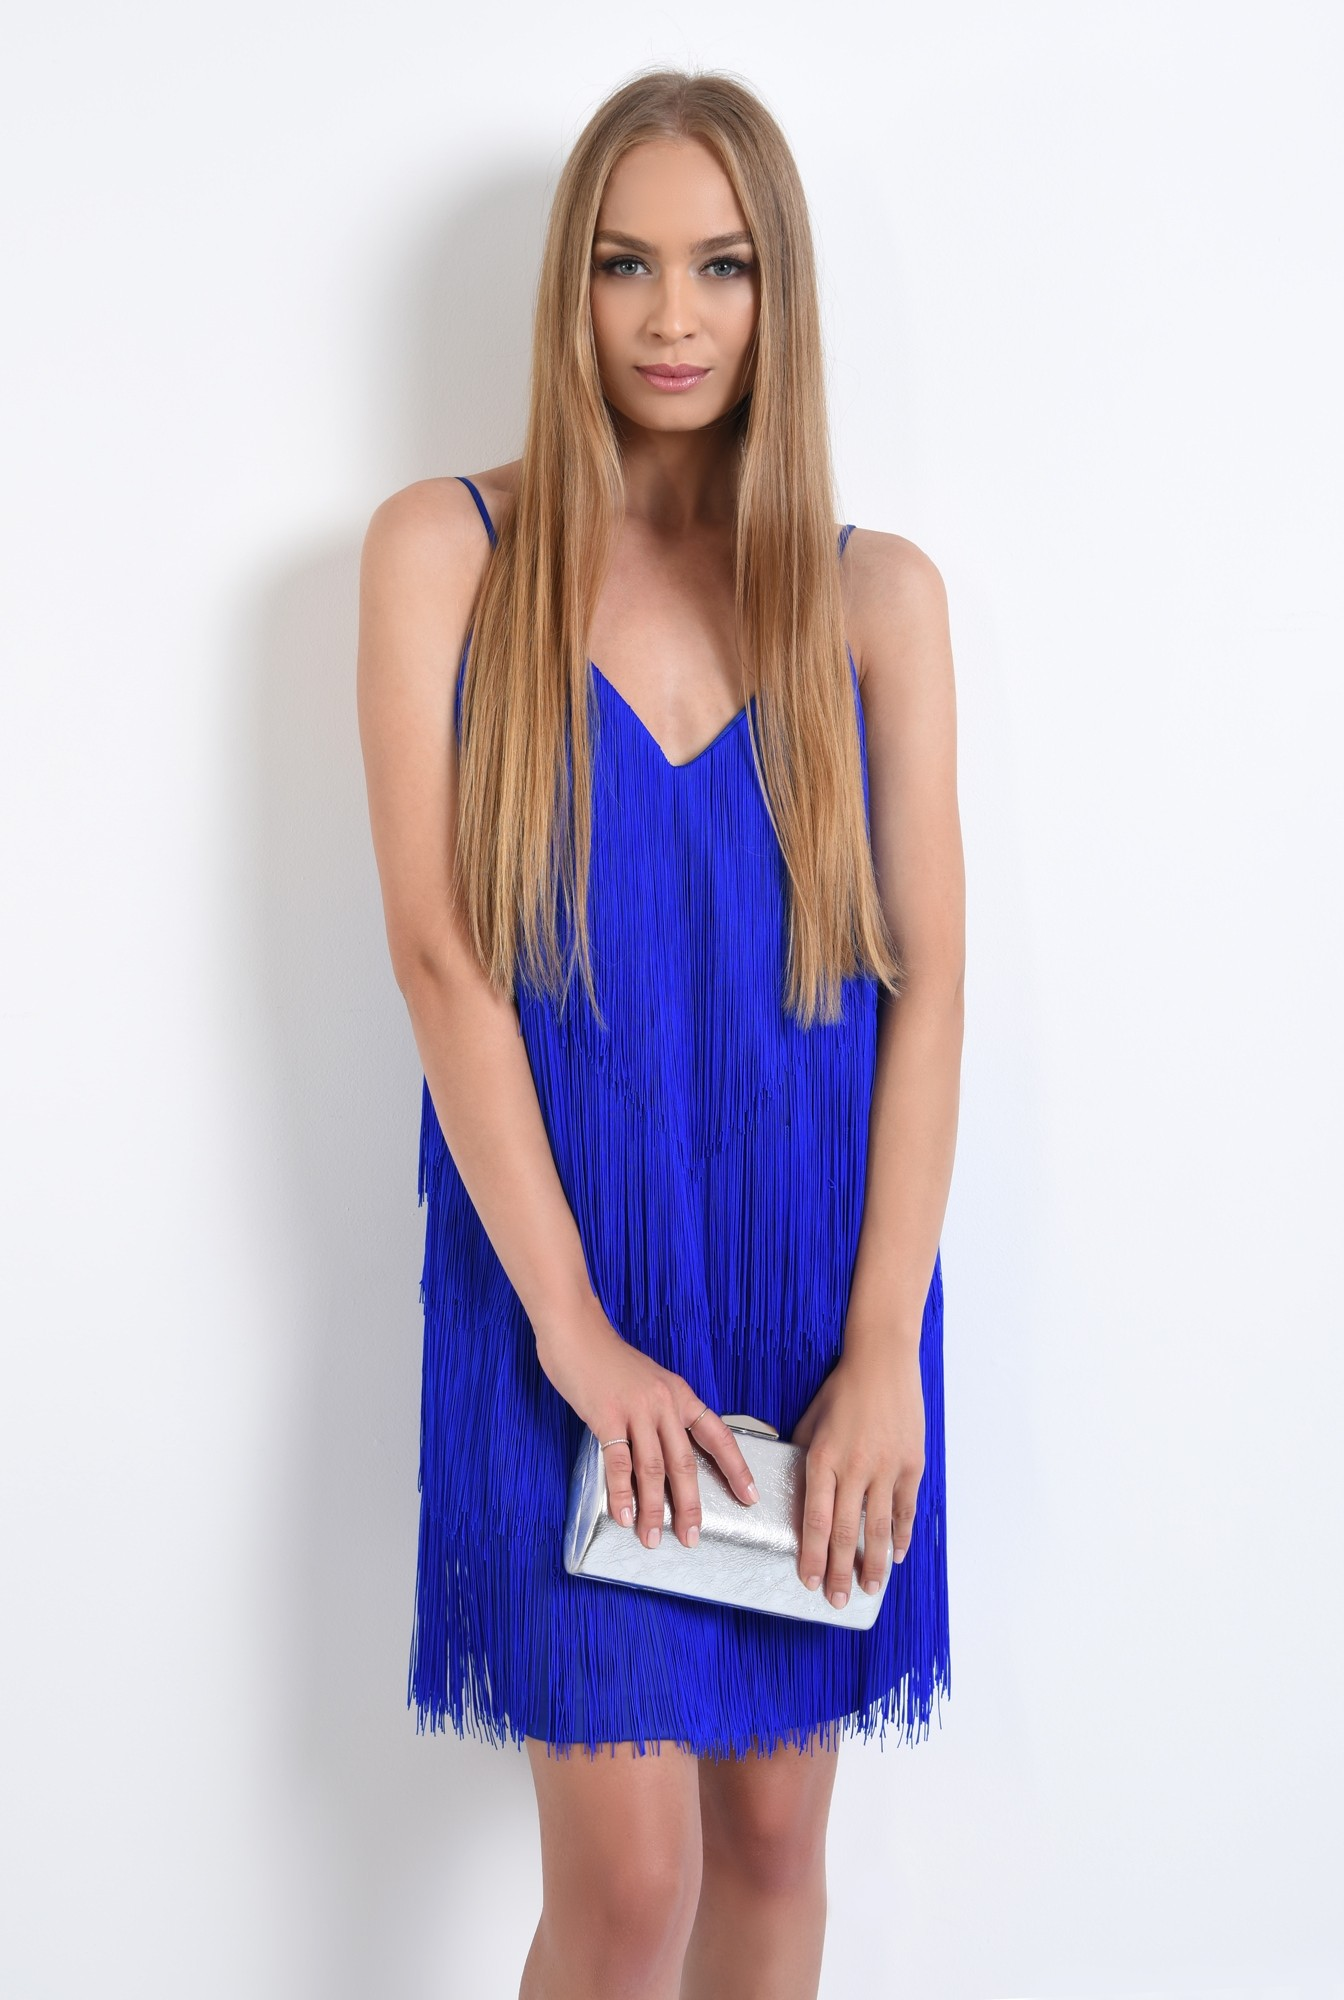 2 - 360 - rochie de seara albastra, cu frajuri, slip on, croi drept, anchior